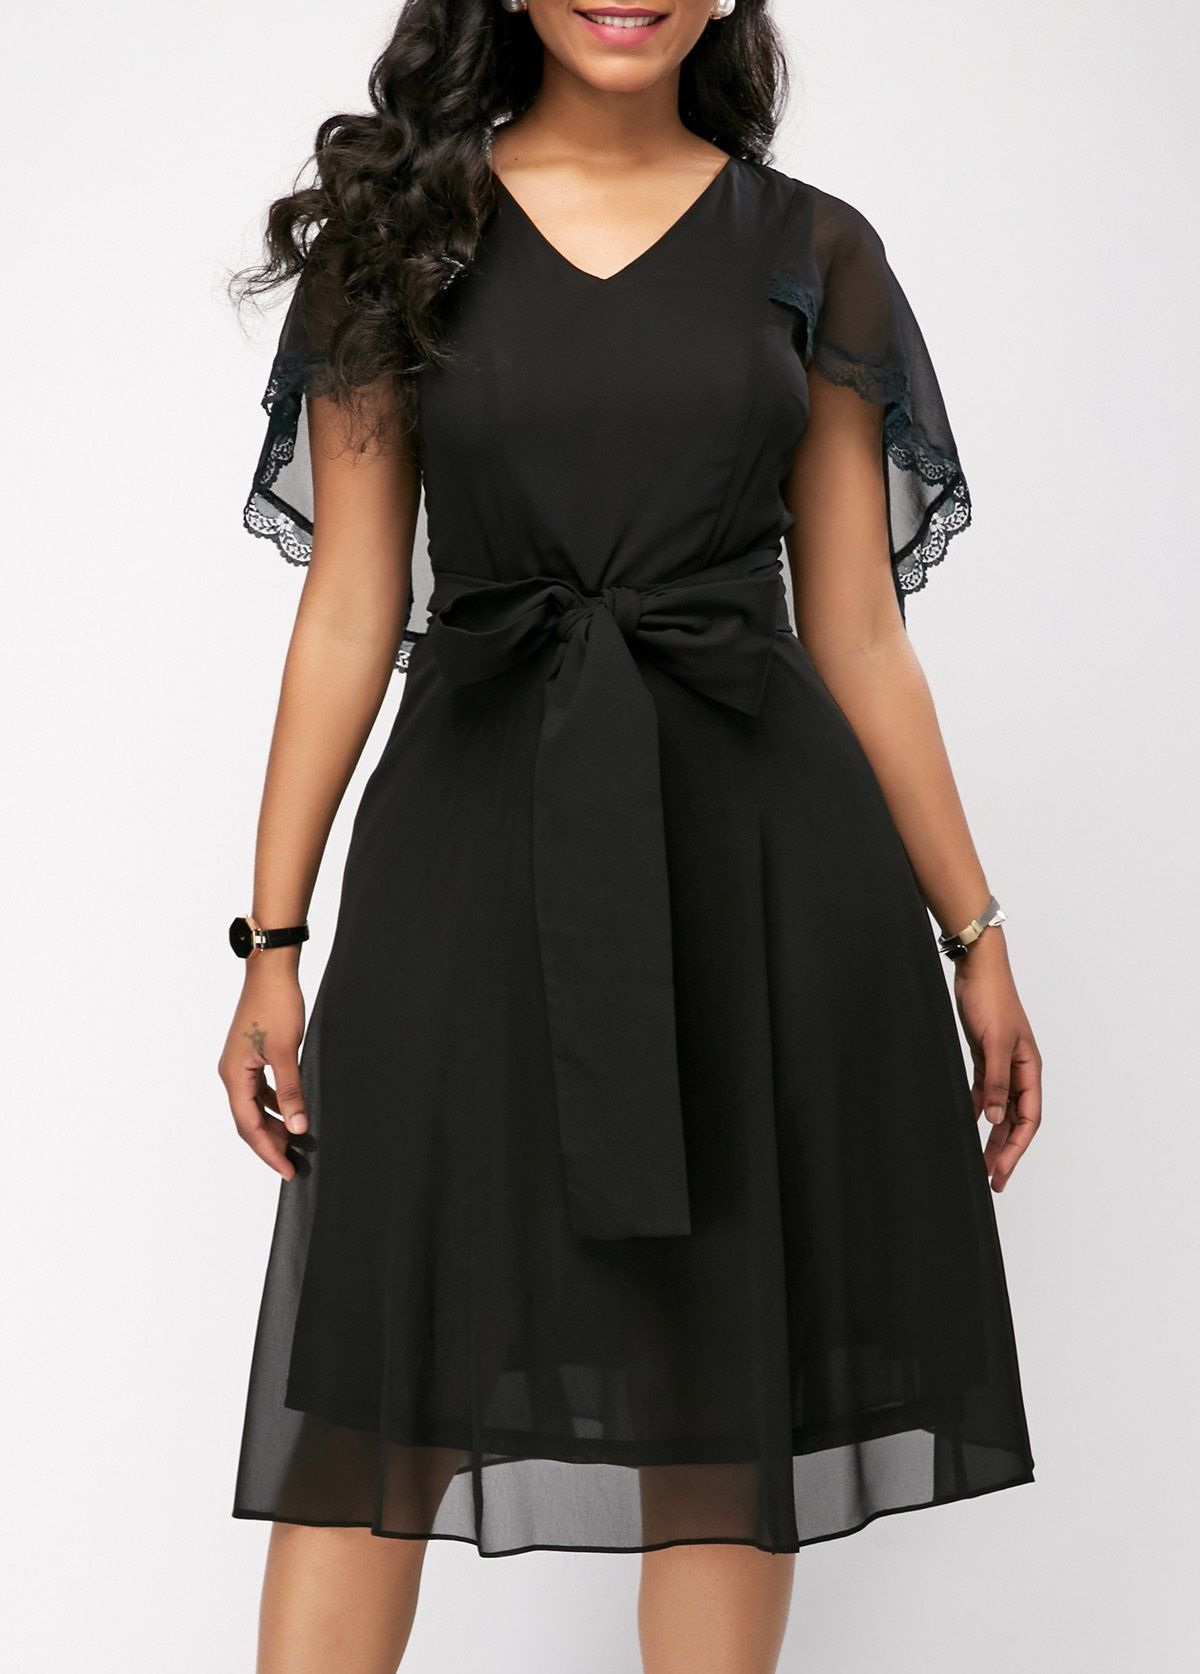 b882bfac5988f7 Mesh Patchwork Belted Chiffon Black Cape Dress. Mesh Patchwork Belted Chiffon  Black Cape Dress Women's Fashion Dresses ...